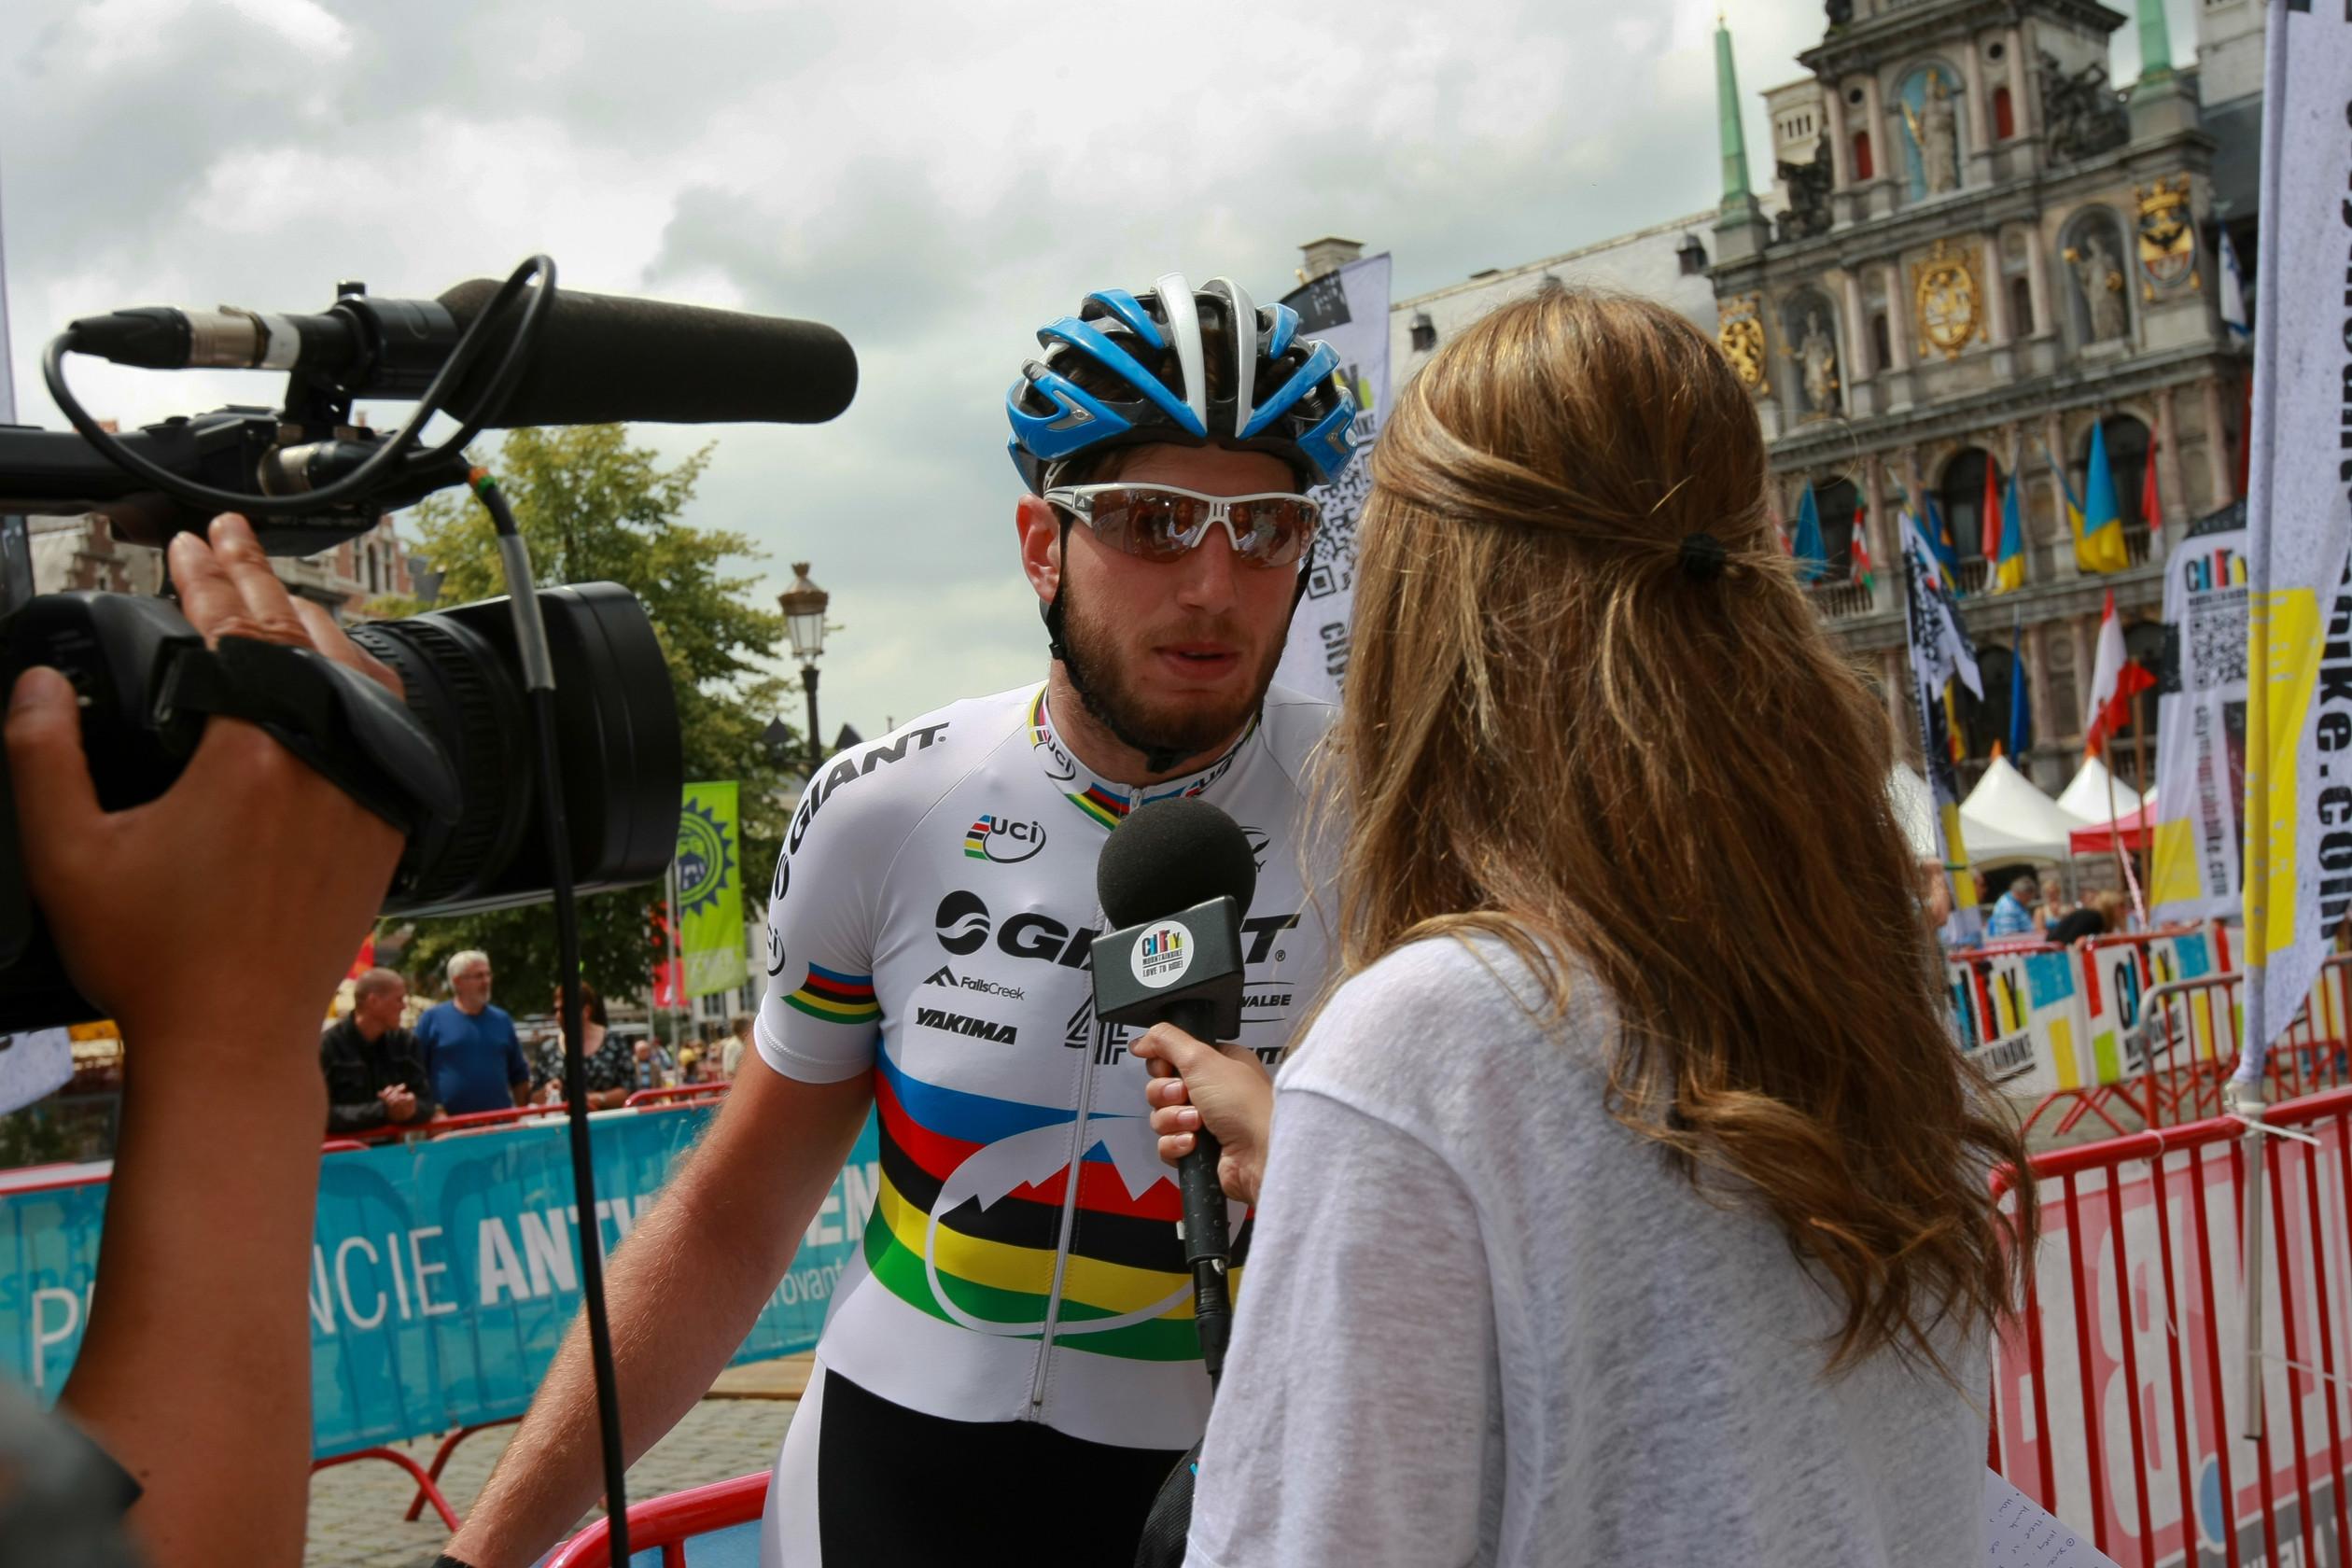 City MTB – UCI Eliminator 300 DPIAntwerpen 2014GLPE160614 9